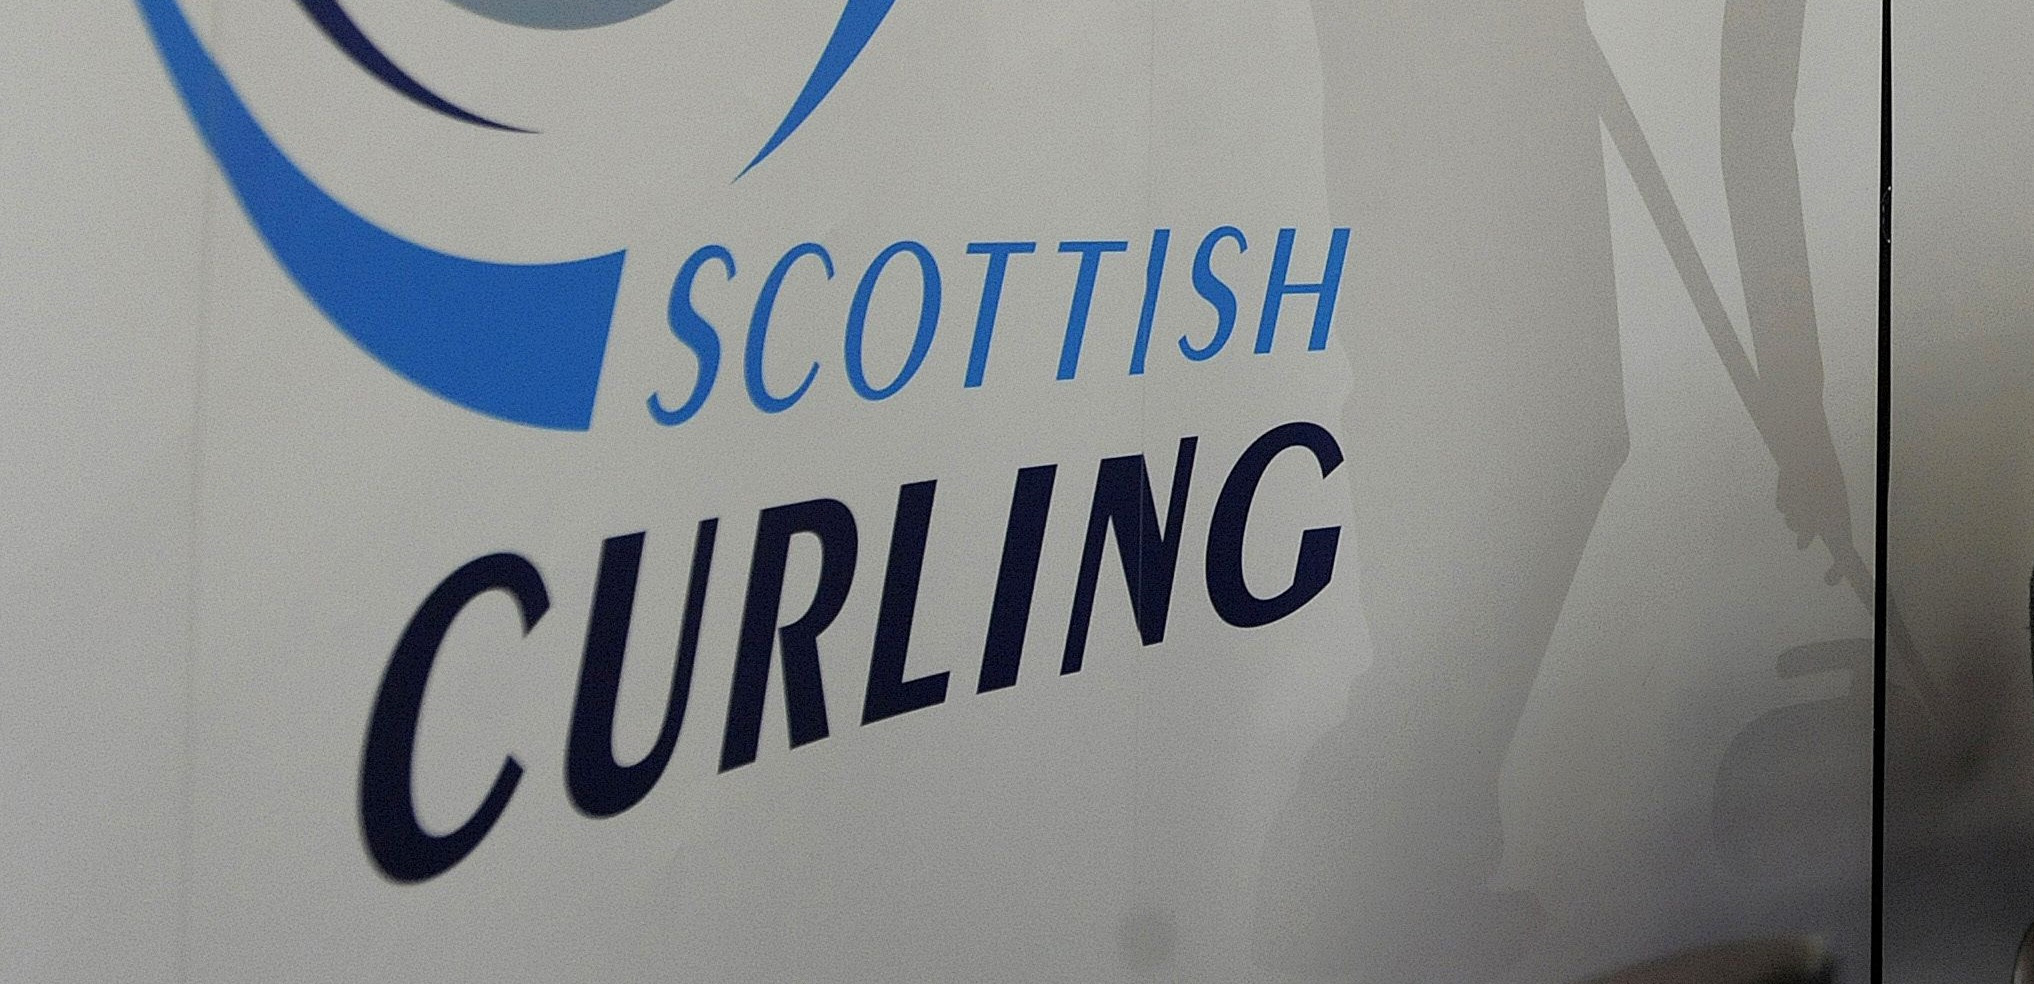 Former Scottish Curling President Thomson dies